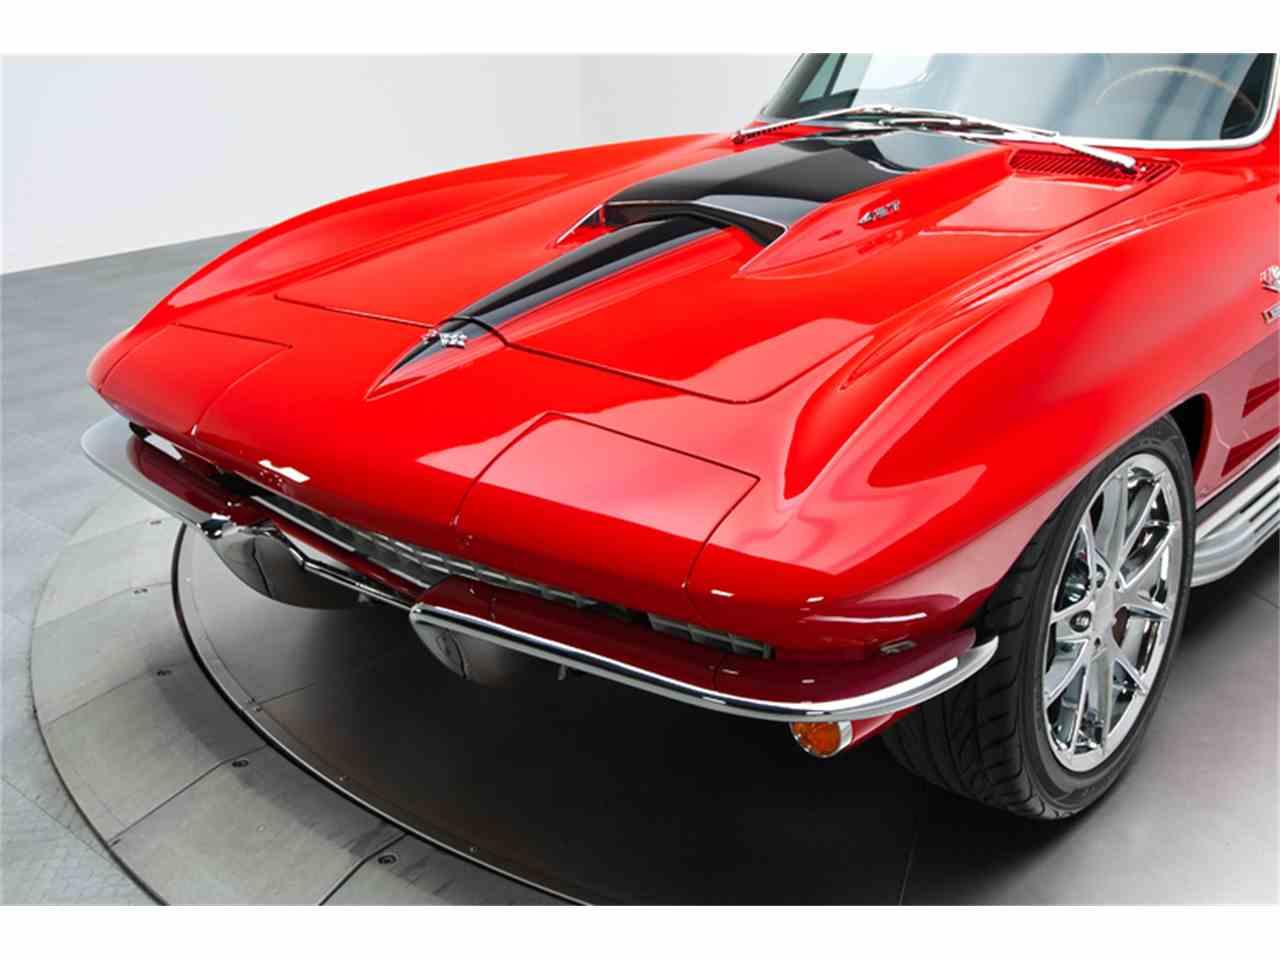 Large Picture of '64 Chevrolet Corvette Stingray - $119,900.00 Offered by RK Motors Charlotte - LT7F